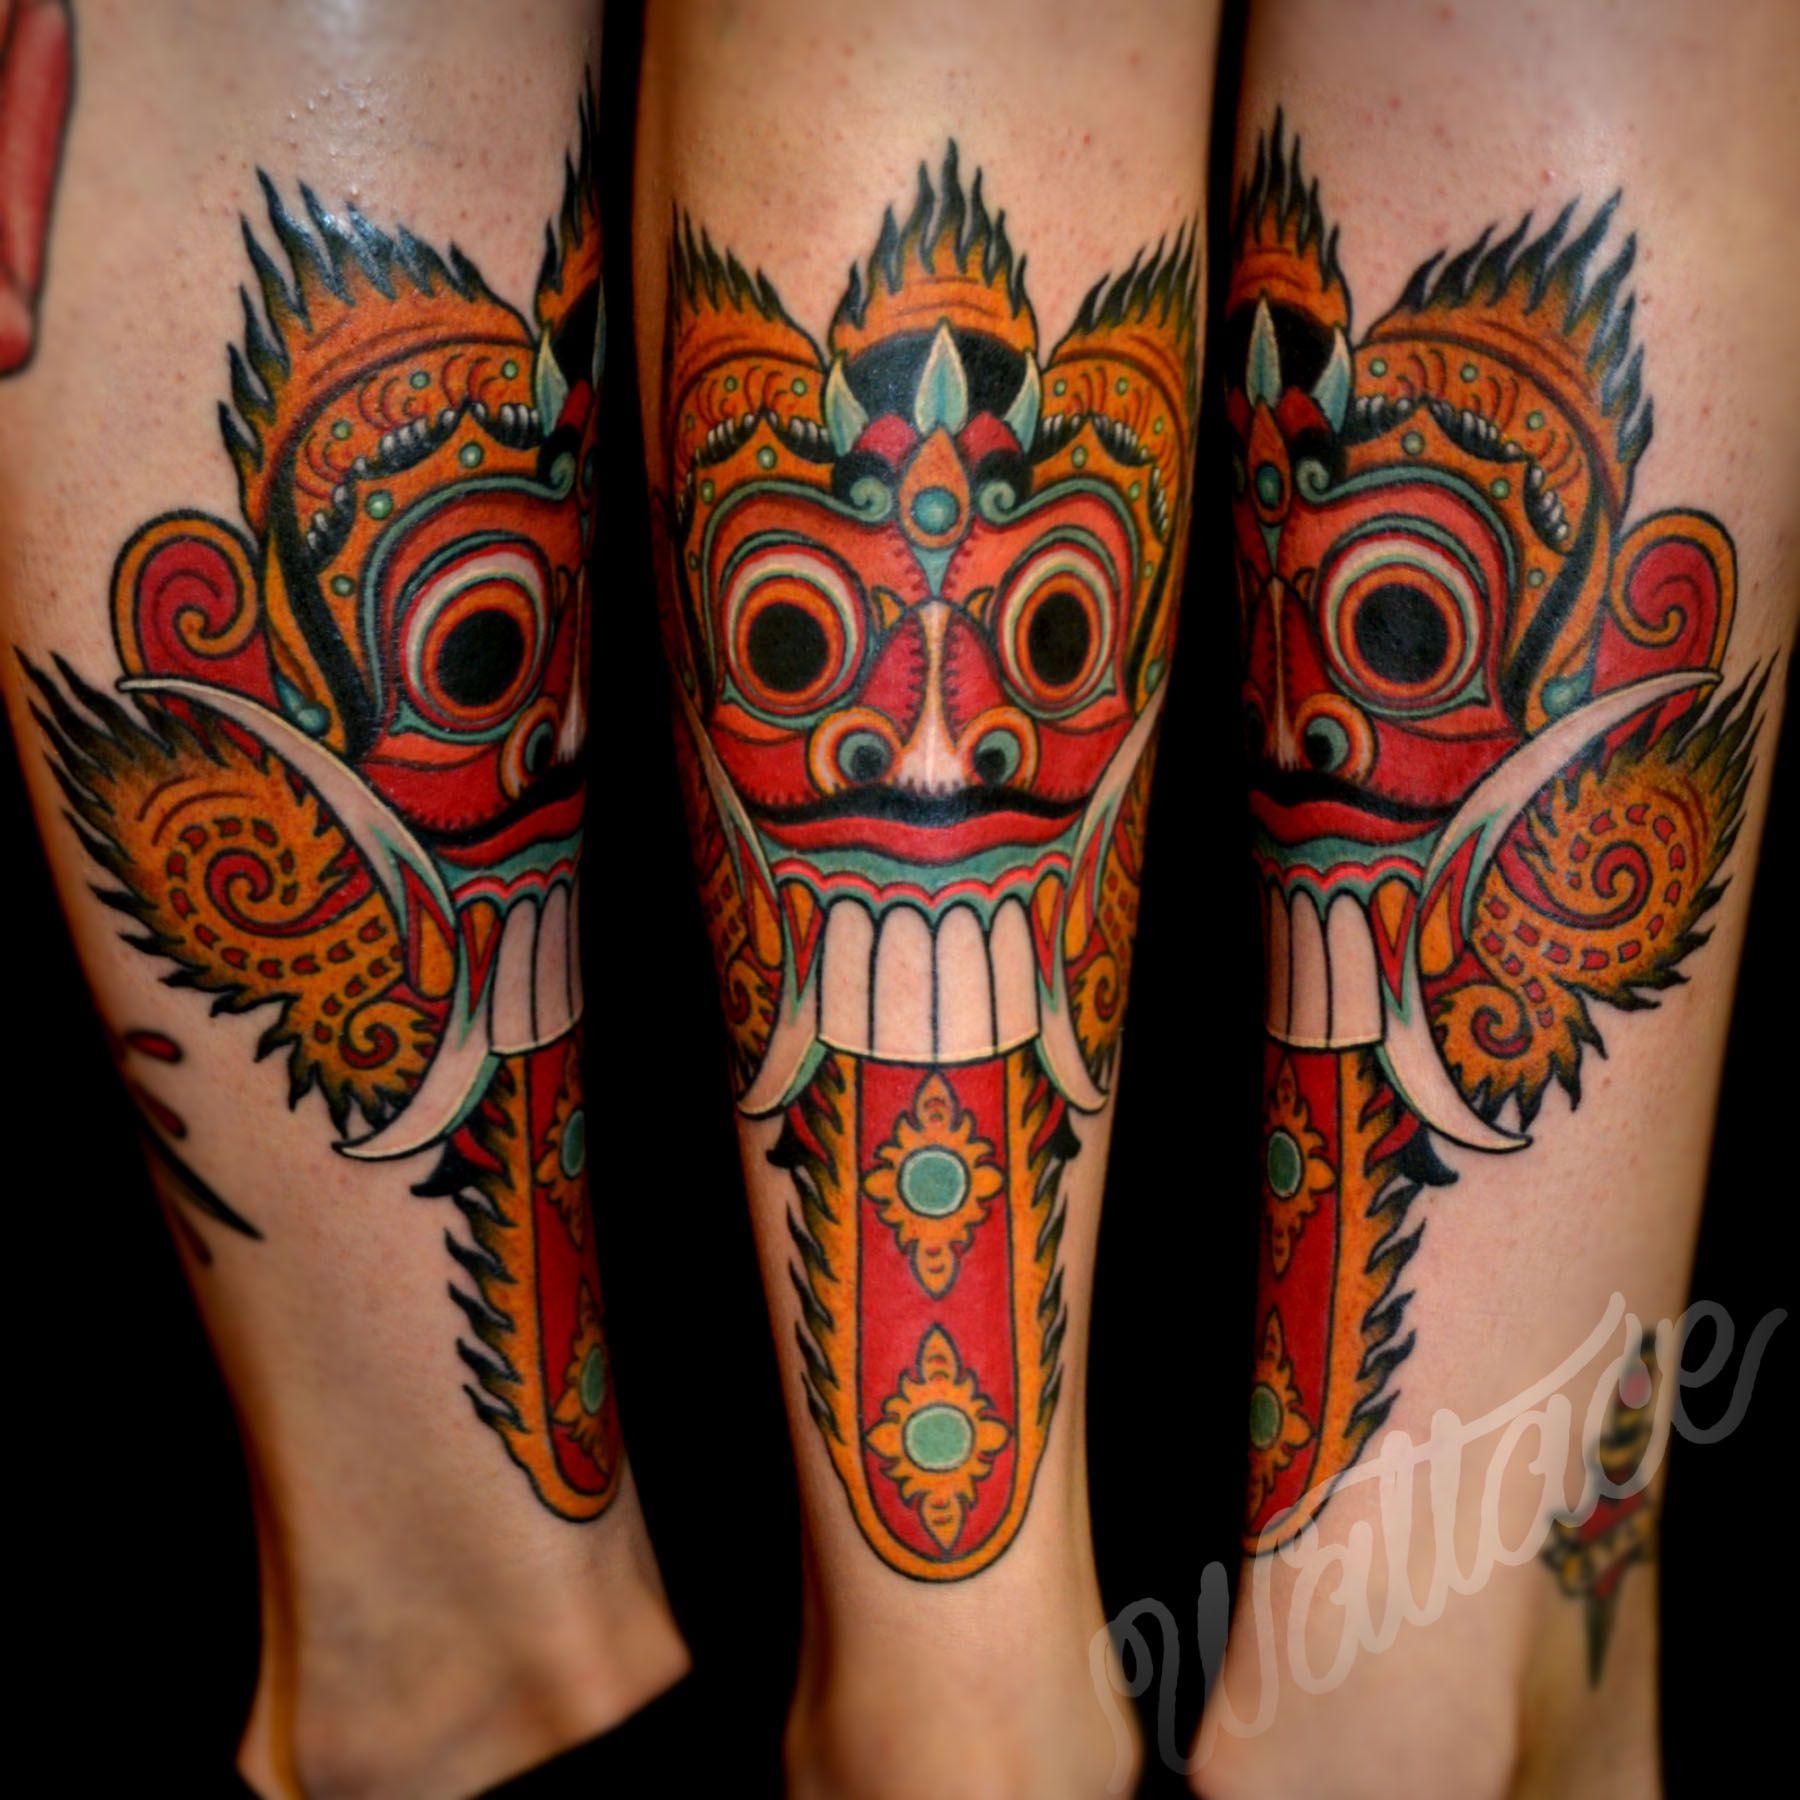 Pin by John Page on tattoos 2.0 Mask tattoo